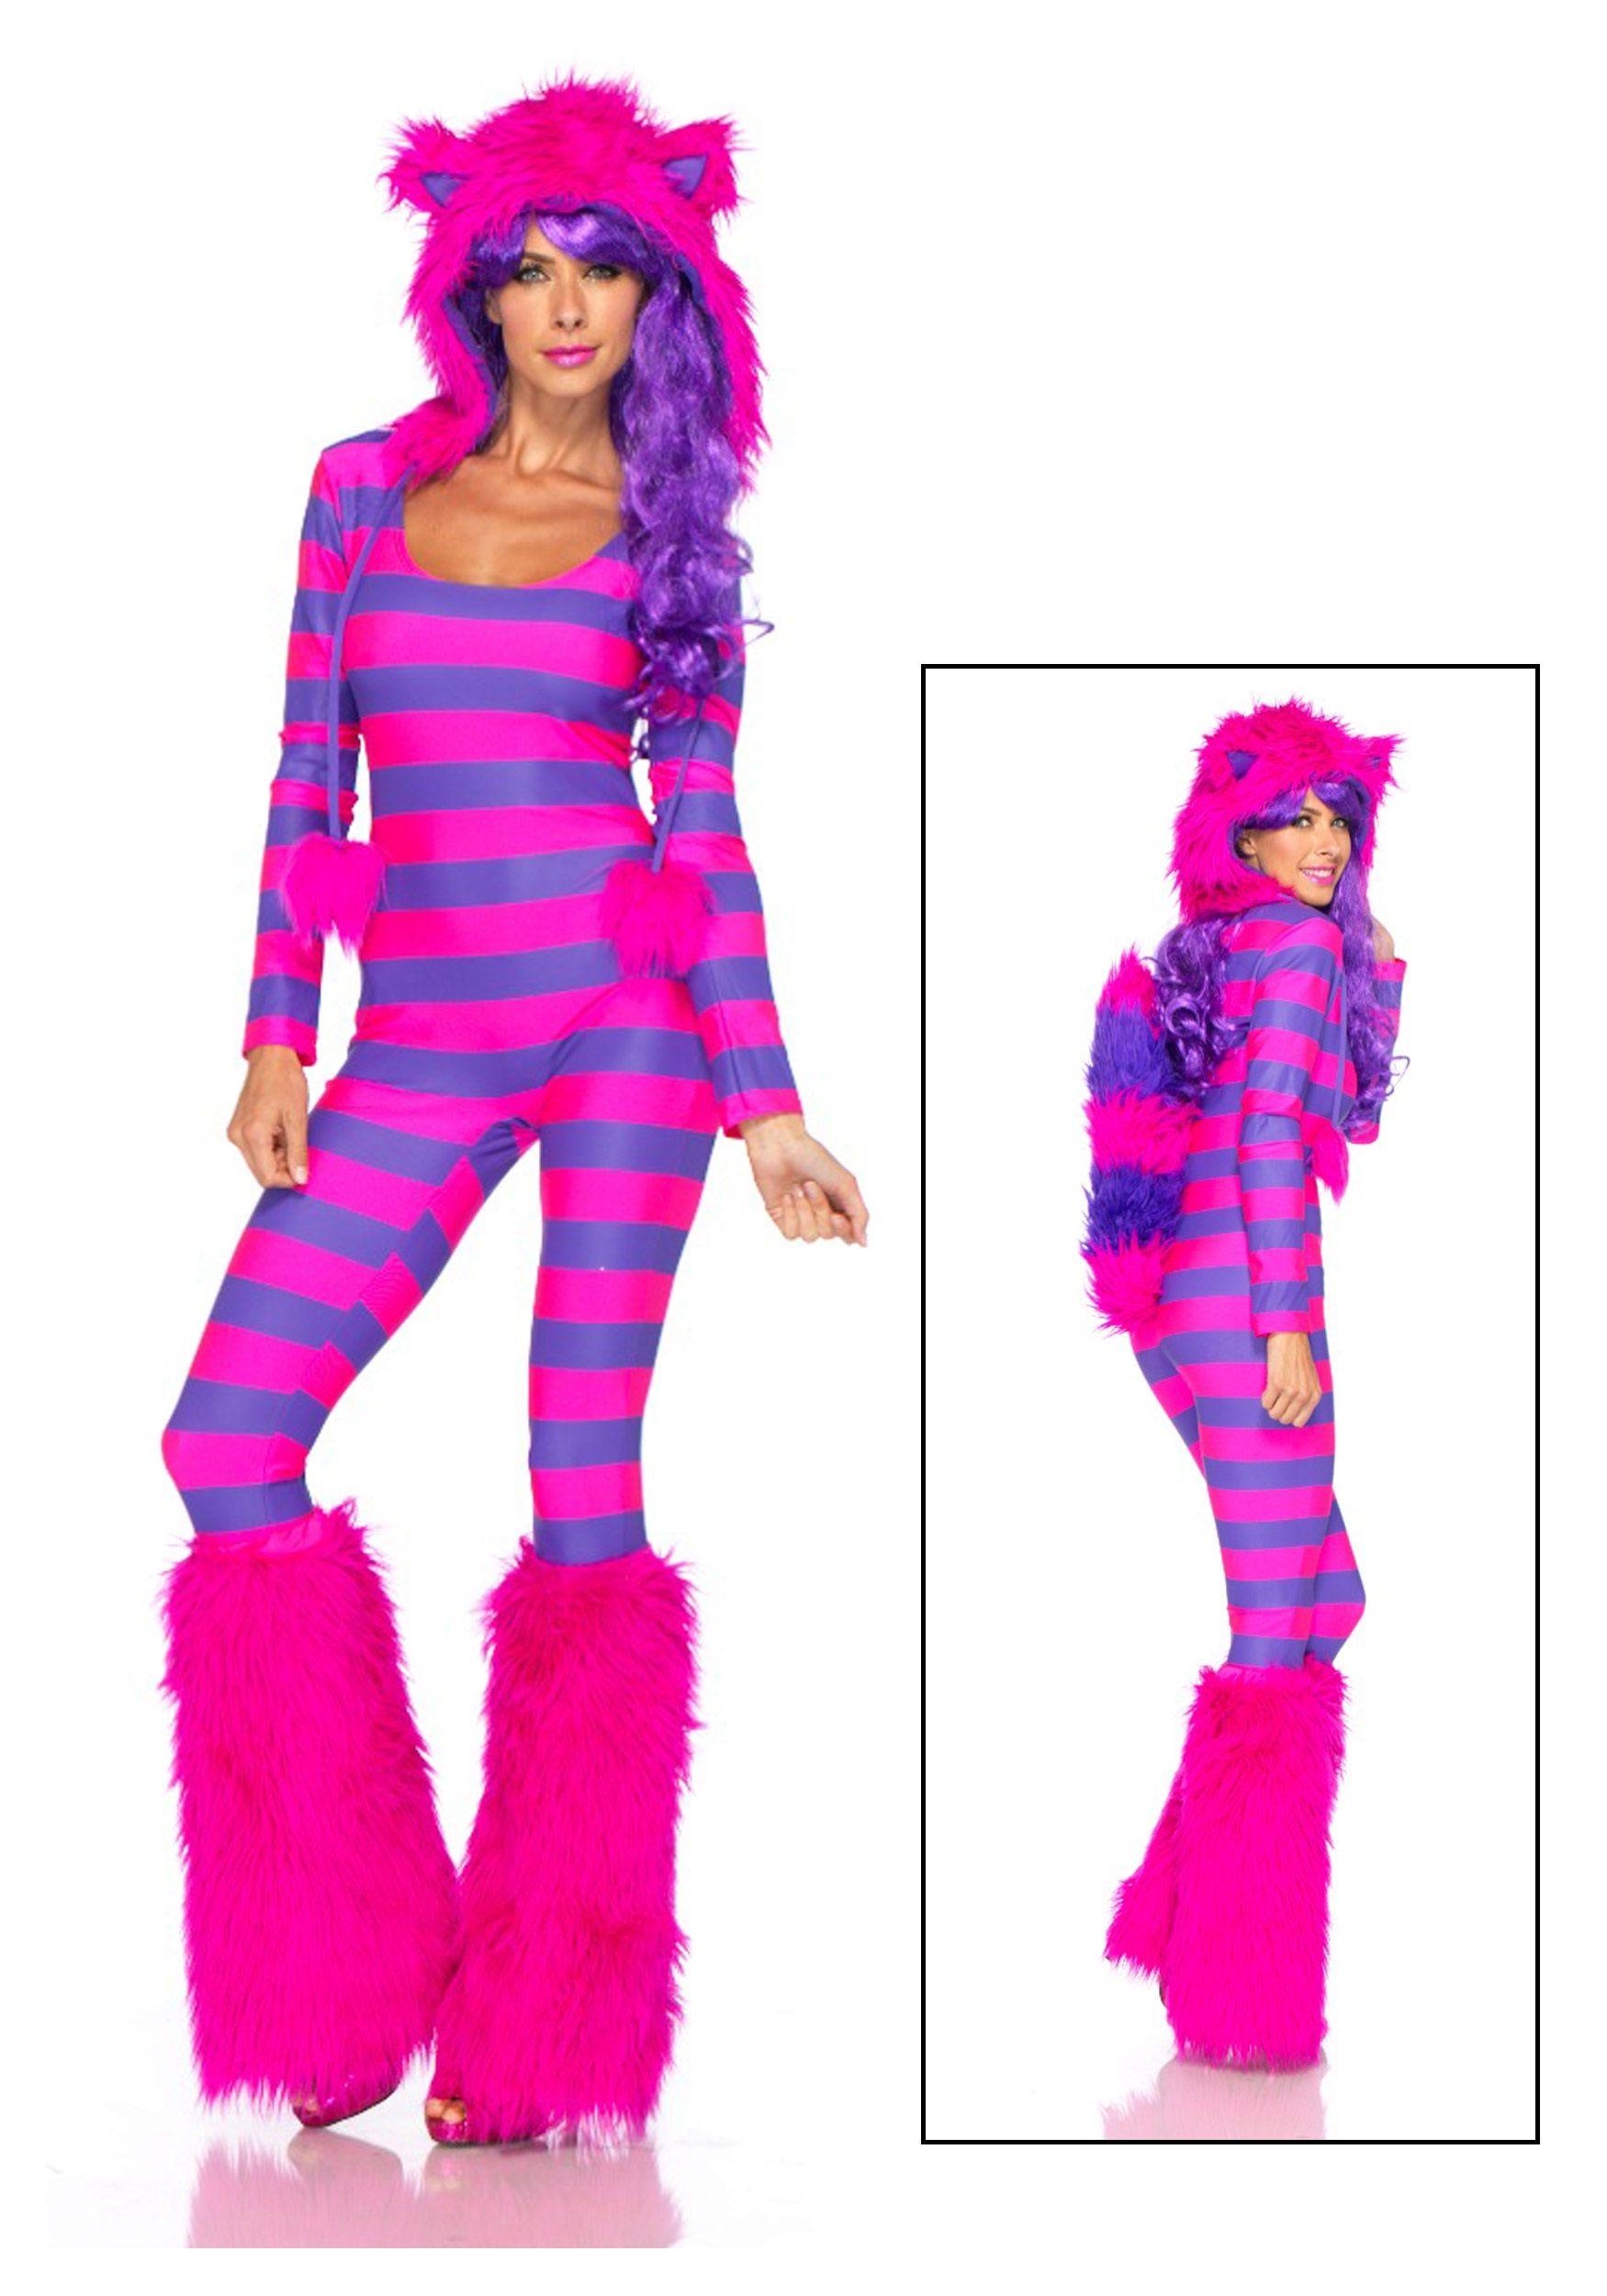 Details Cheshire Cat Costume Adult Halloween Fancy Dress